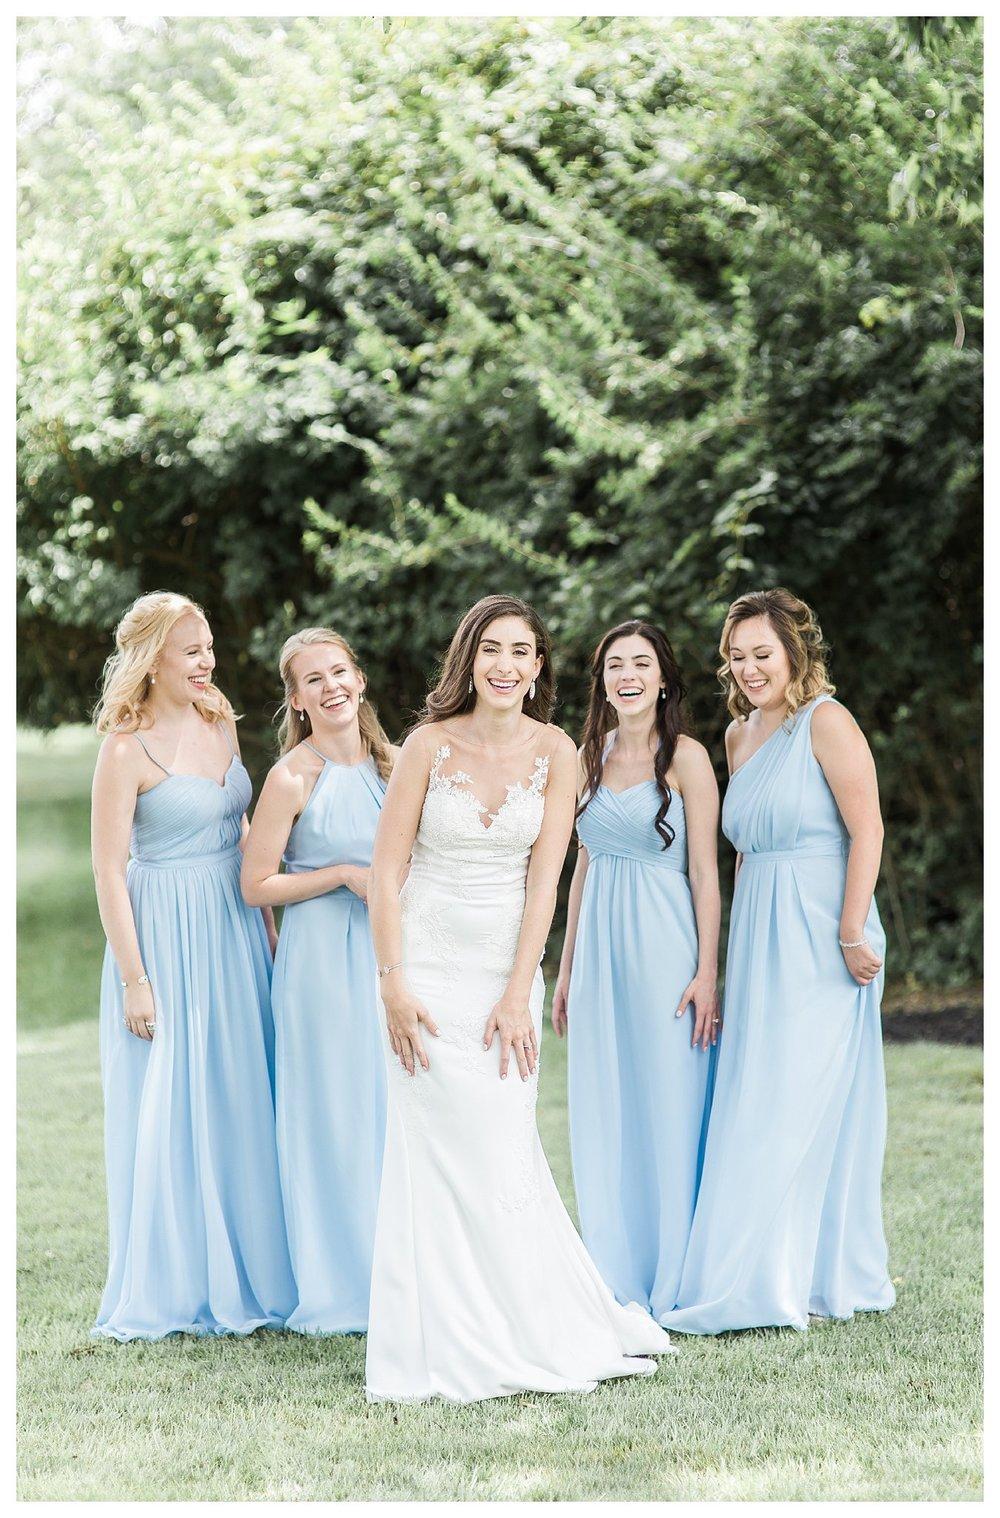 everleigh-photography-cincinnati-wedding-photographer-the-backstage-event-center-adamandlauren-21